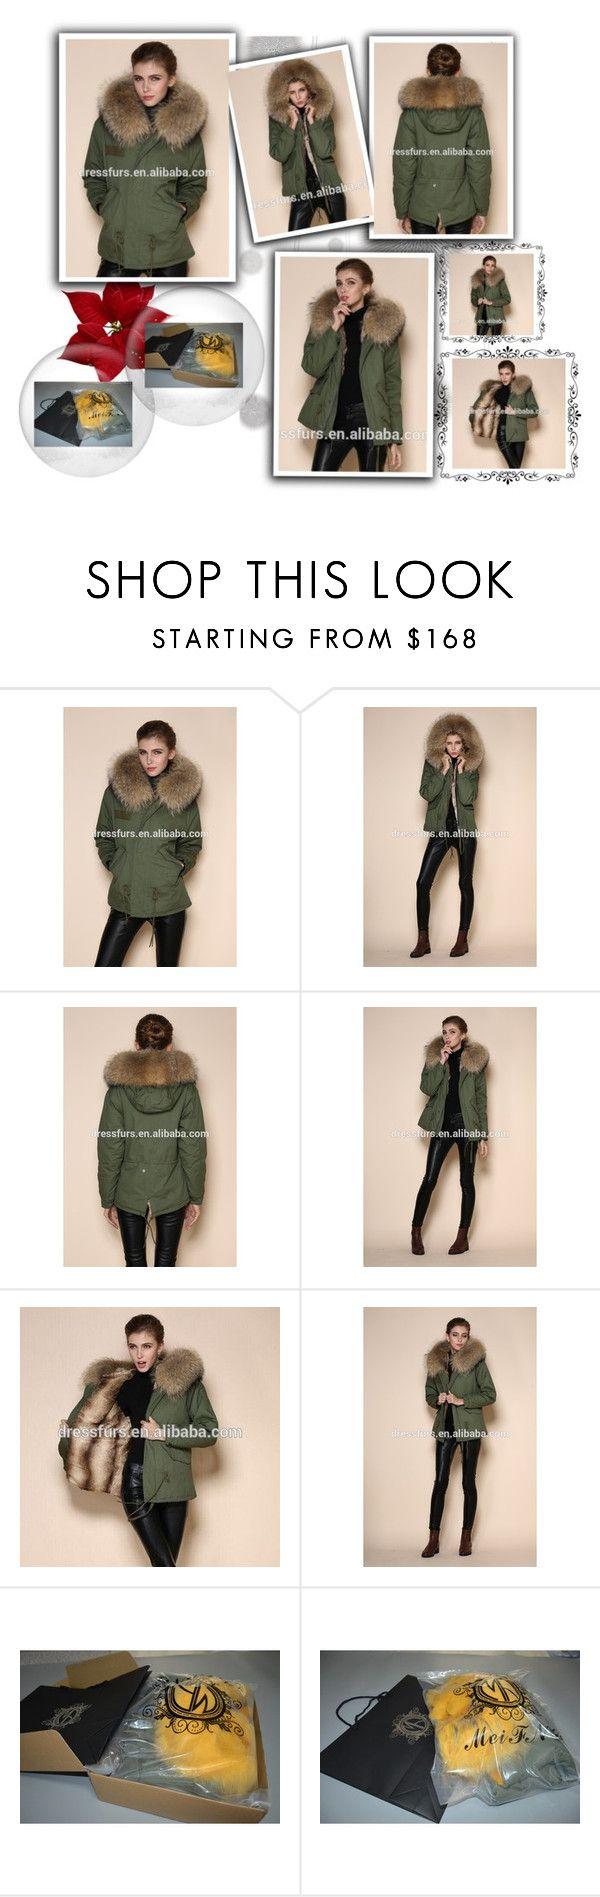 """outstanding design overcoat soft touching rex rabbit jacket ladies parka coats"" by dressfurs on Polyvore featuring Komar, rabbitfur, womenparka, jackat and softshelljacket"